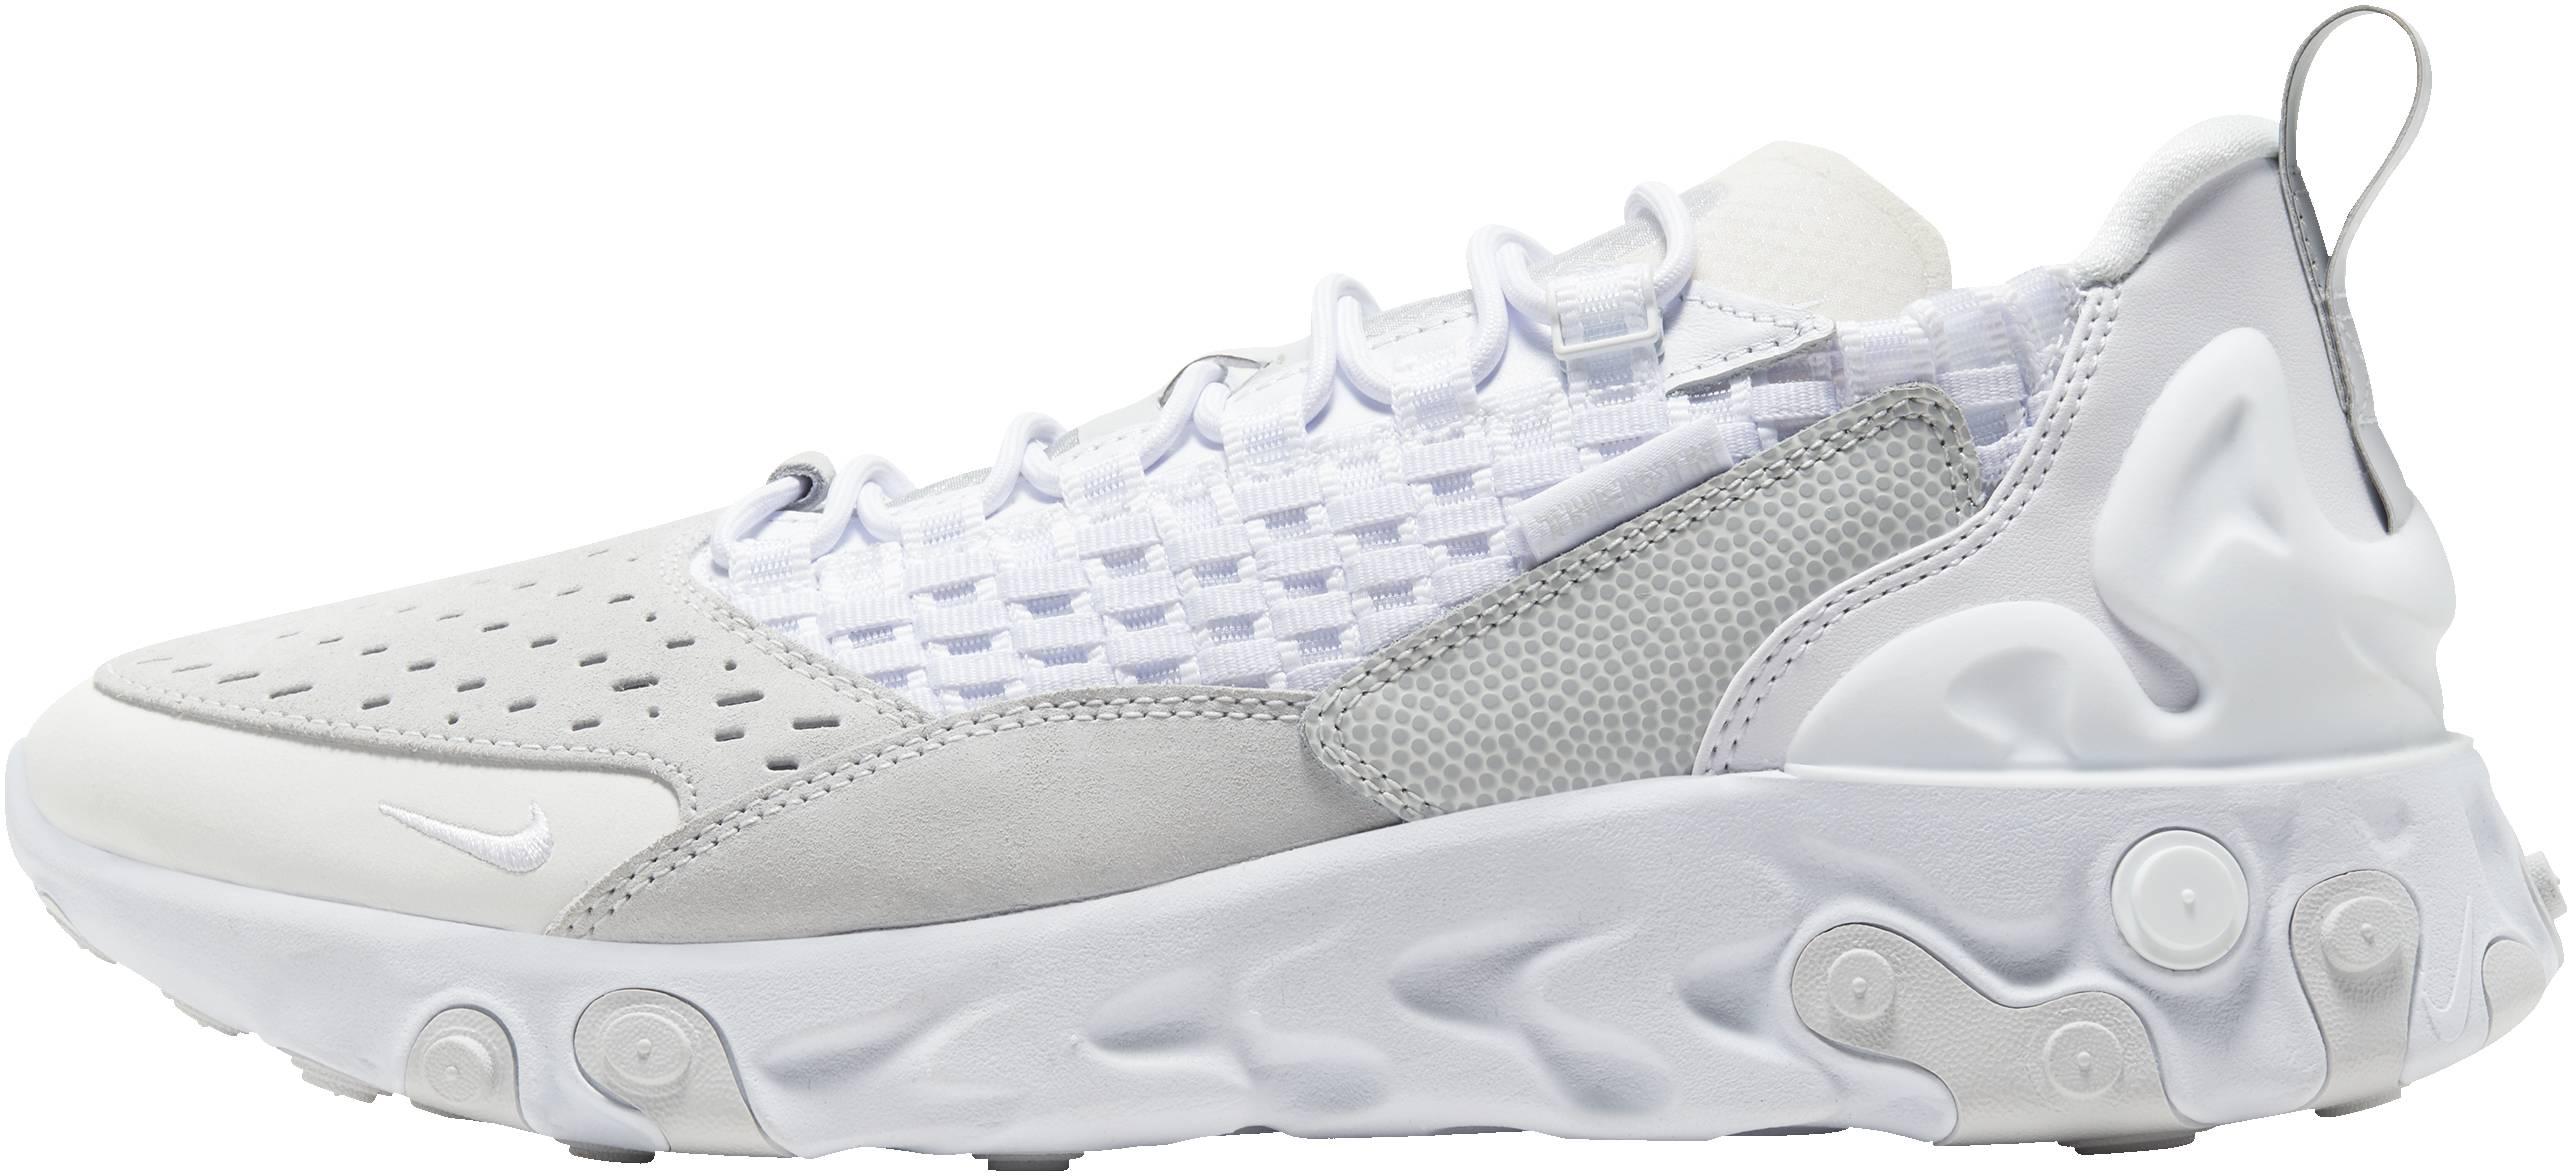 Nike React Sertu sneakers in 7 colors (only $87)   RunRepeat